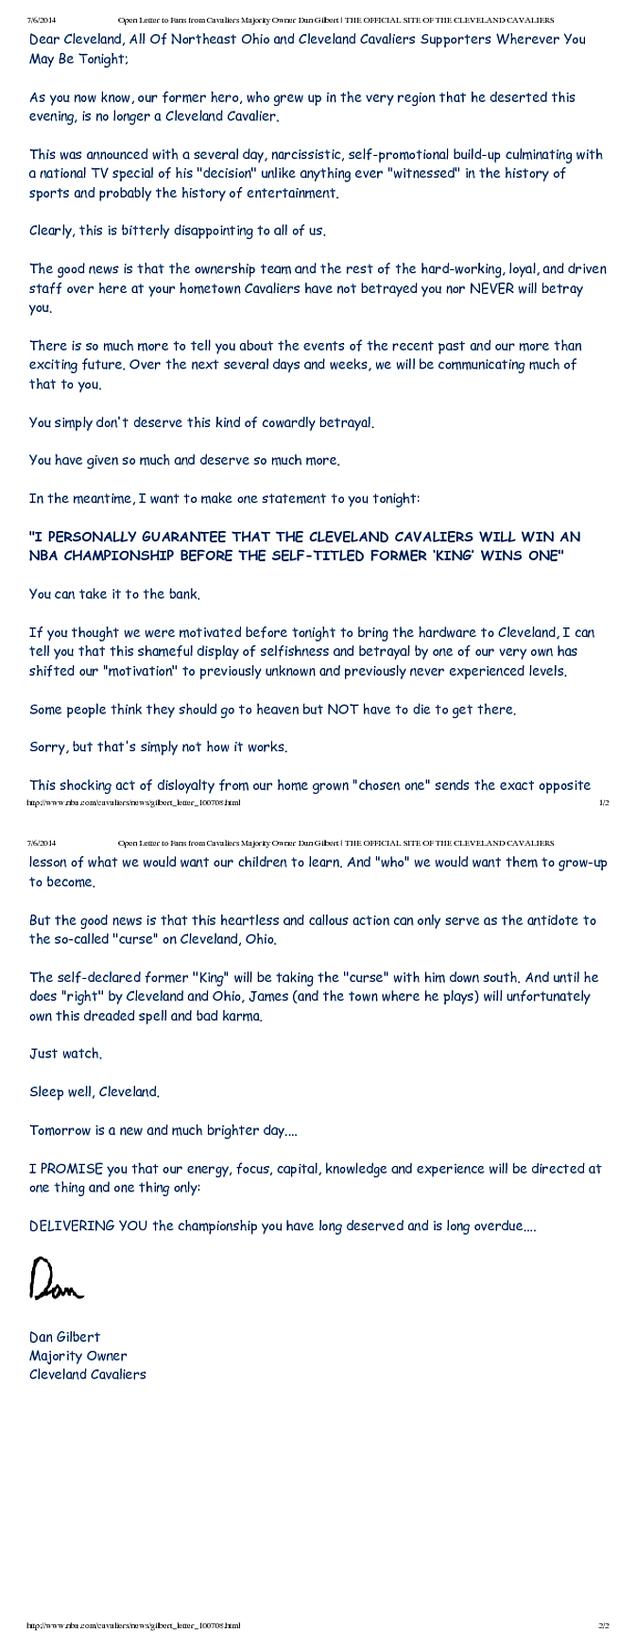 The Cavaliers Finally Took Down Dan Gilbert's Insane Comic Sans Letter